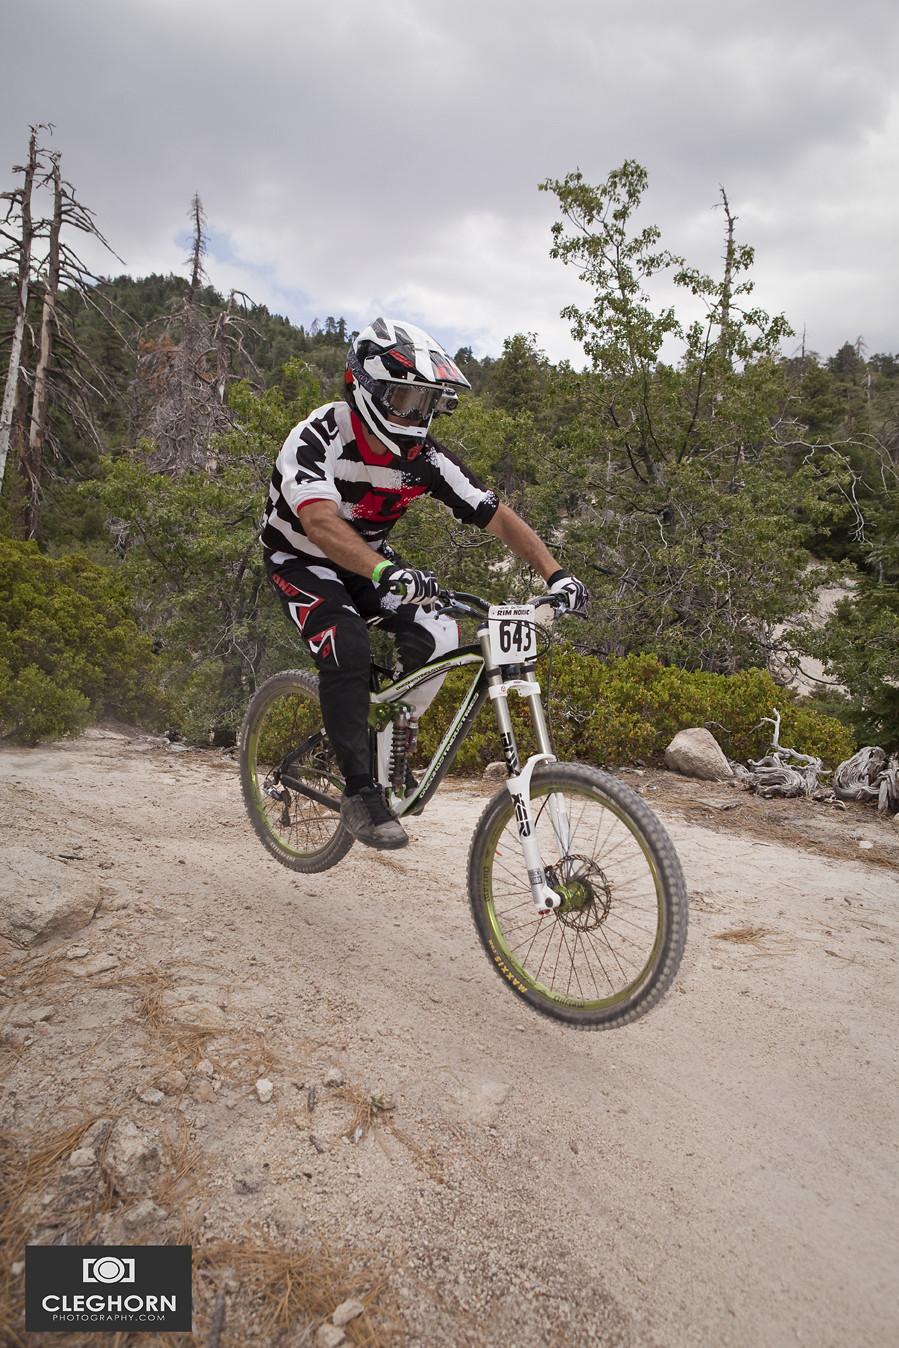 MG 0497 - Cleghorn Photography - Mountain Biking Pictures - Vital MTB